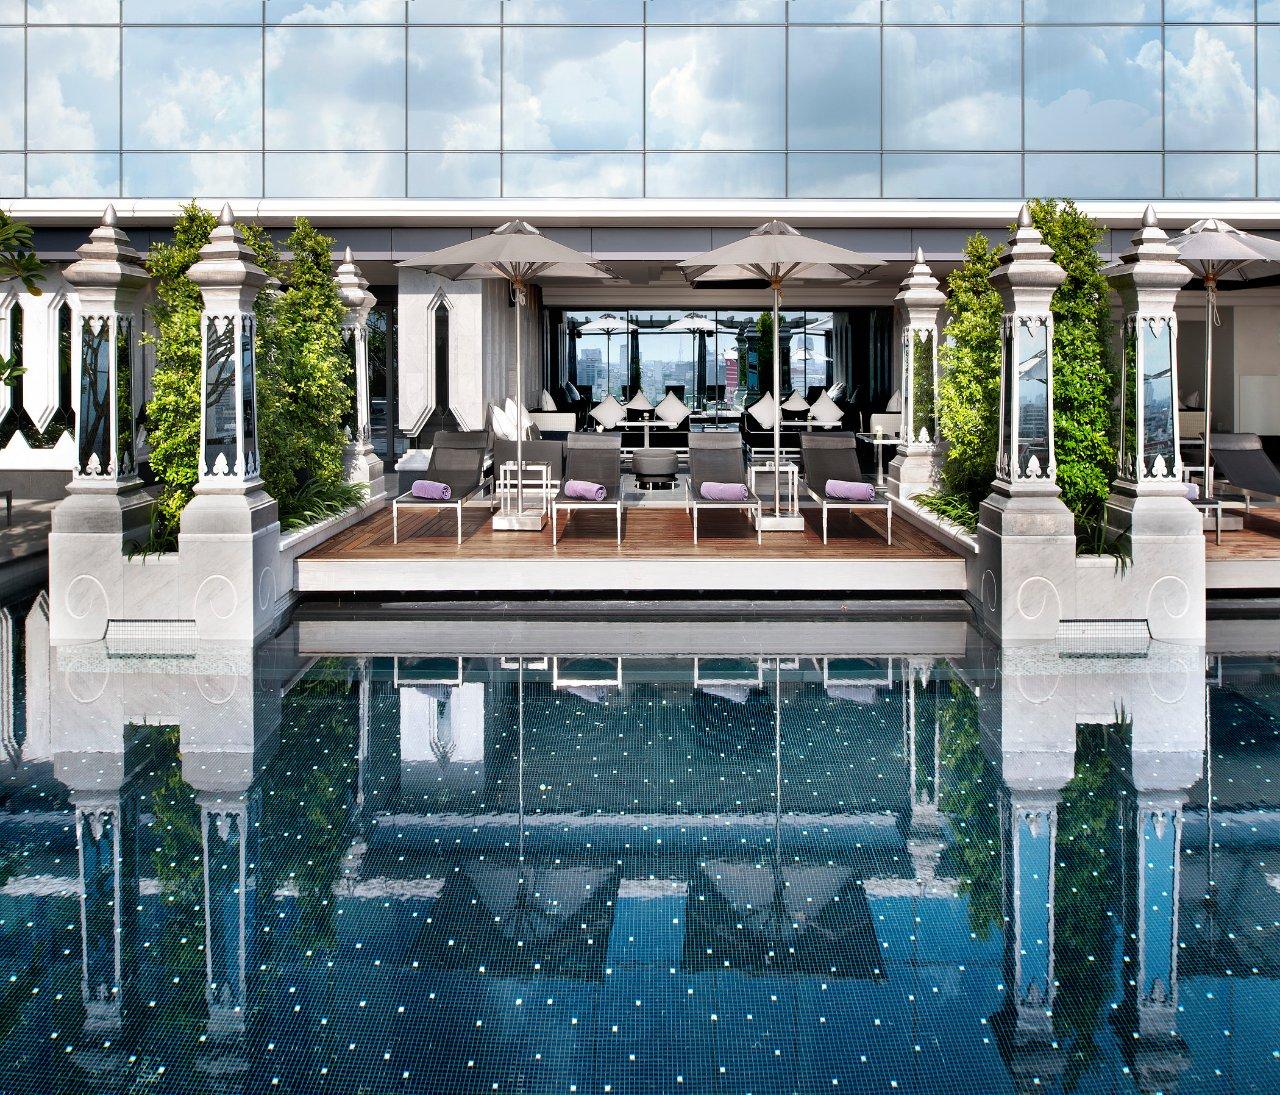 The St. Regis Bangkok 5* LUXE - agence de voyage sur mesure luxe